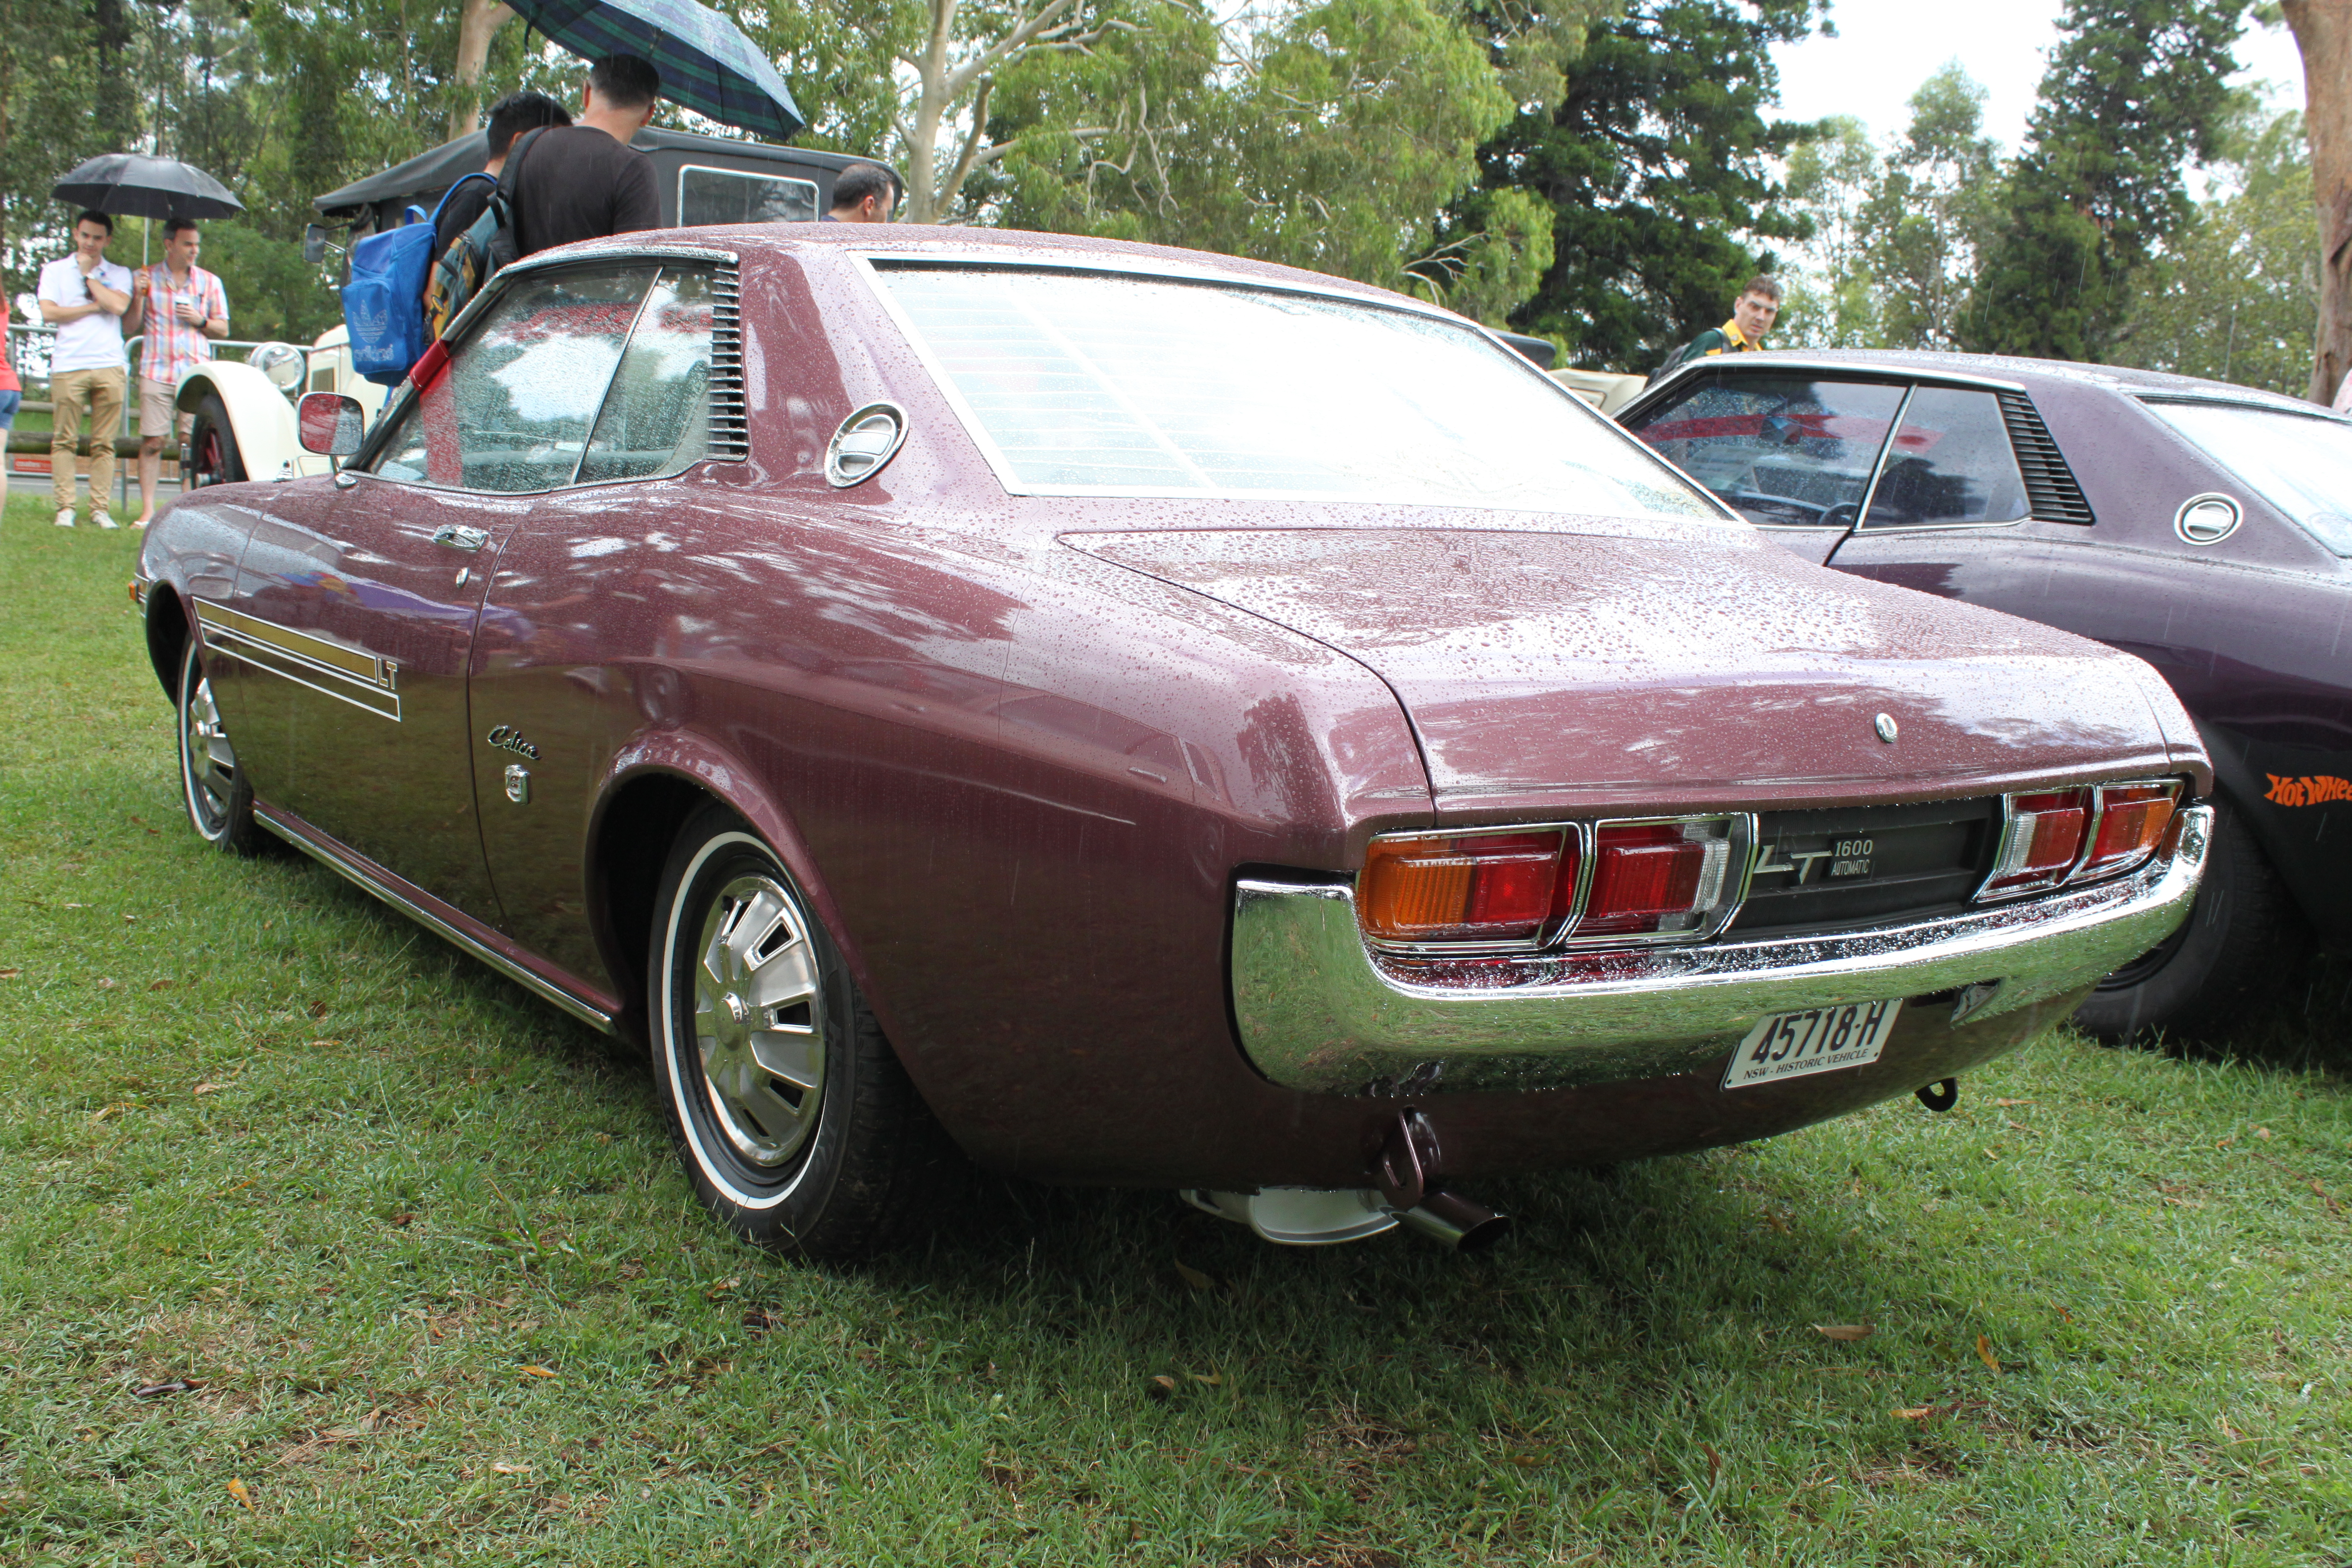 New Toyota Celica >> File:1972-1975 Toyota Celica (TA22) LT coupe (25211941985).jpg - Wikimedia Commons